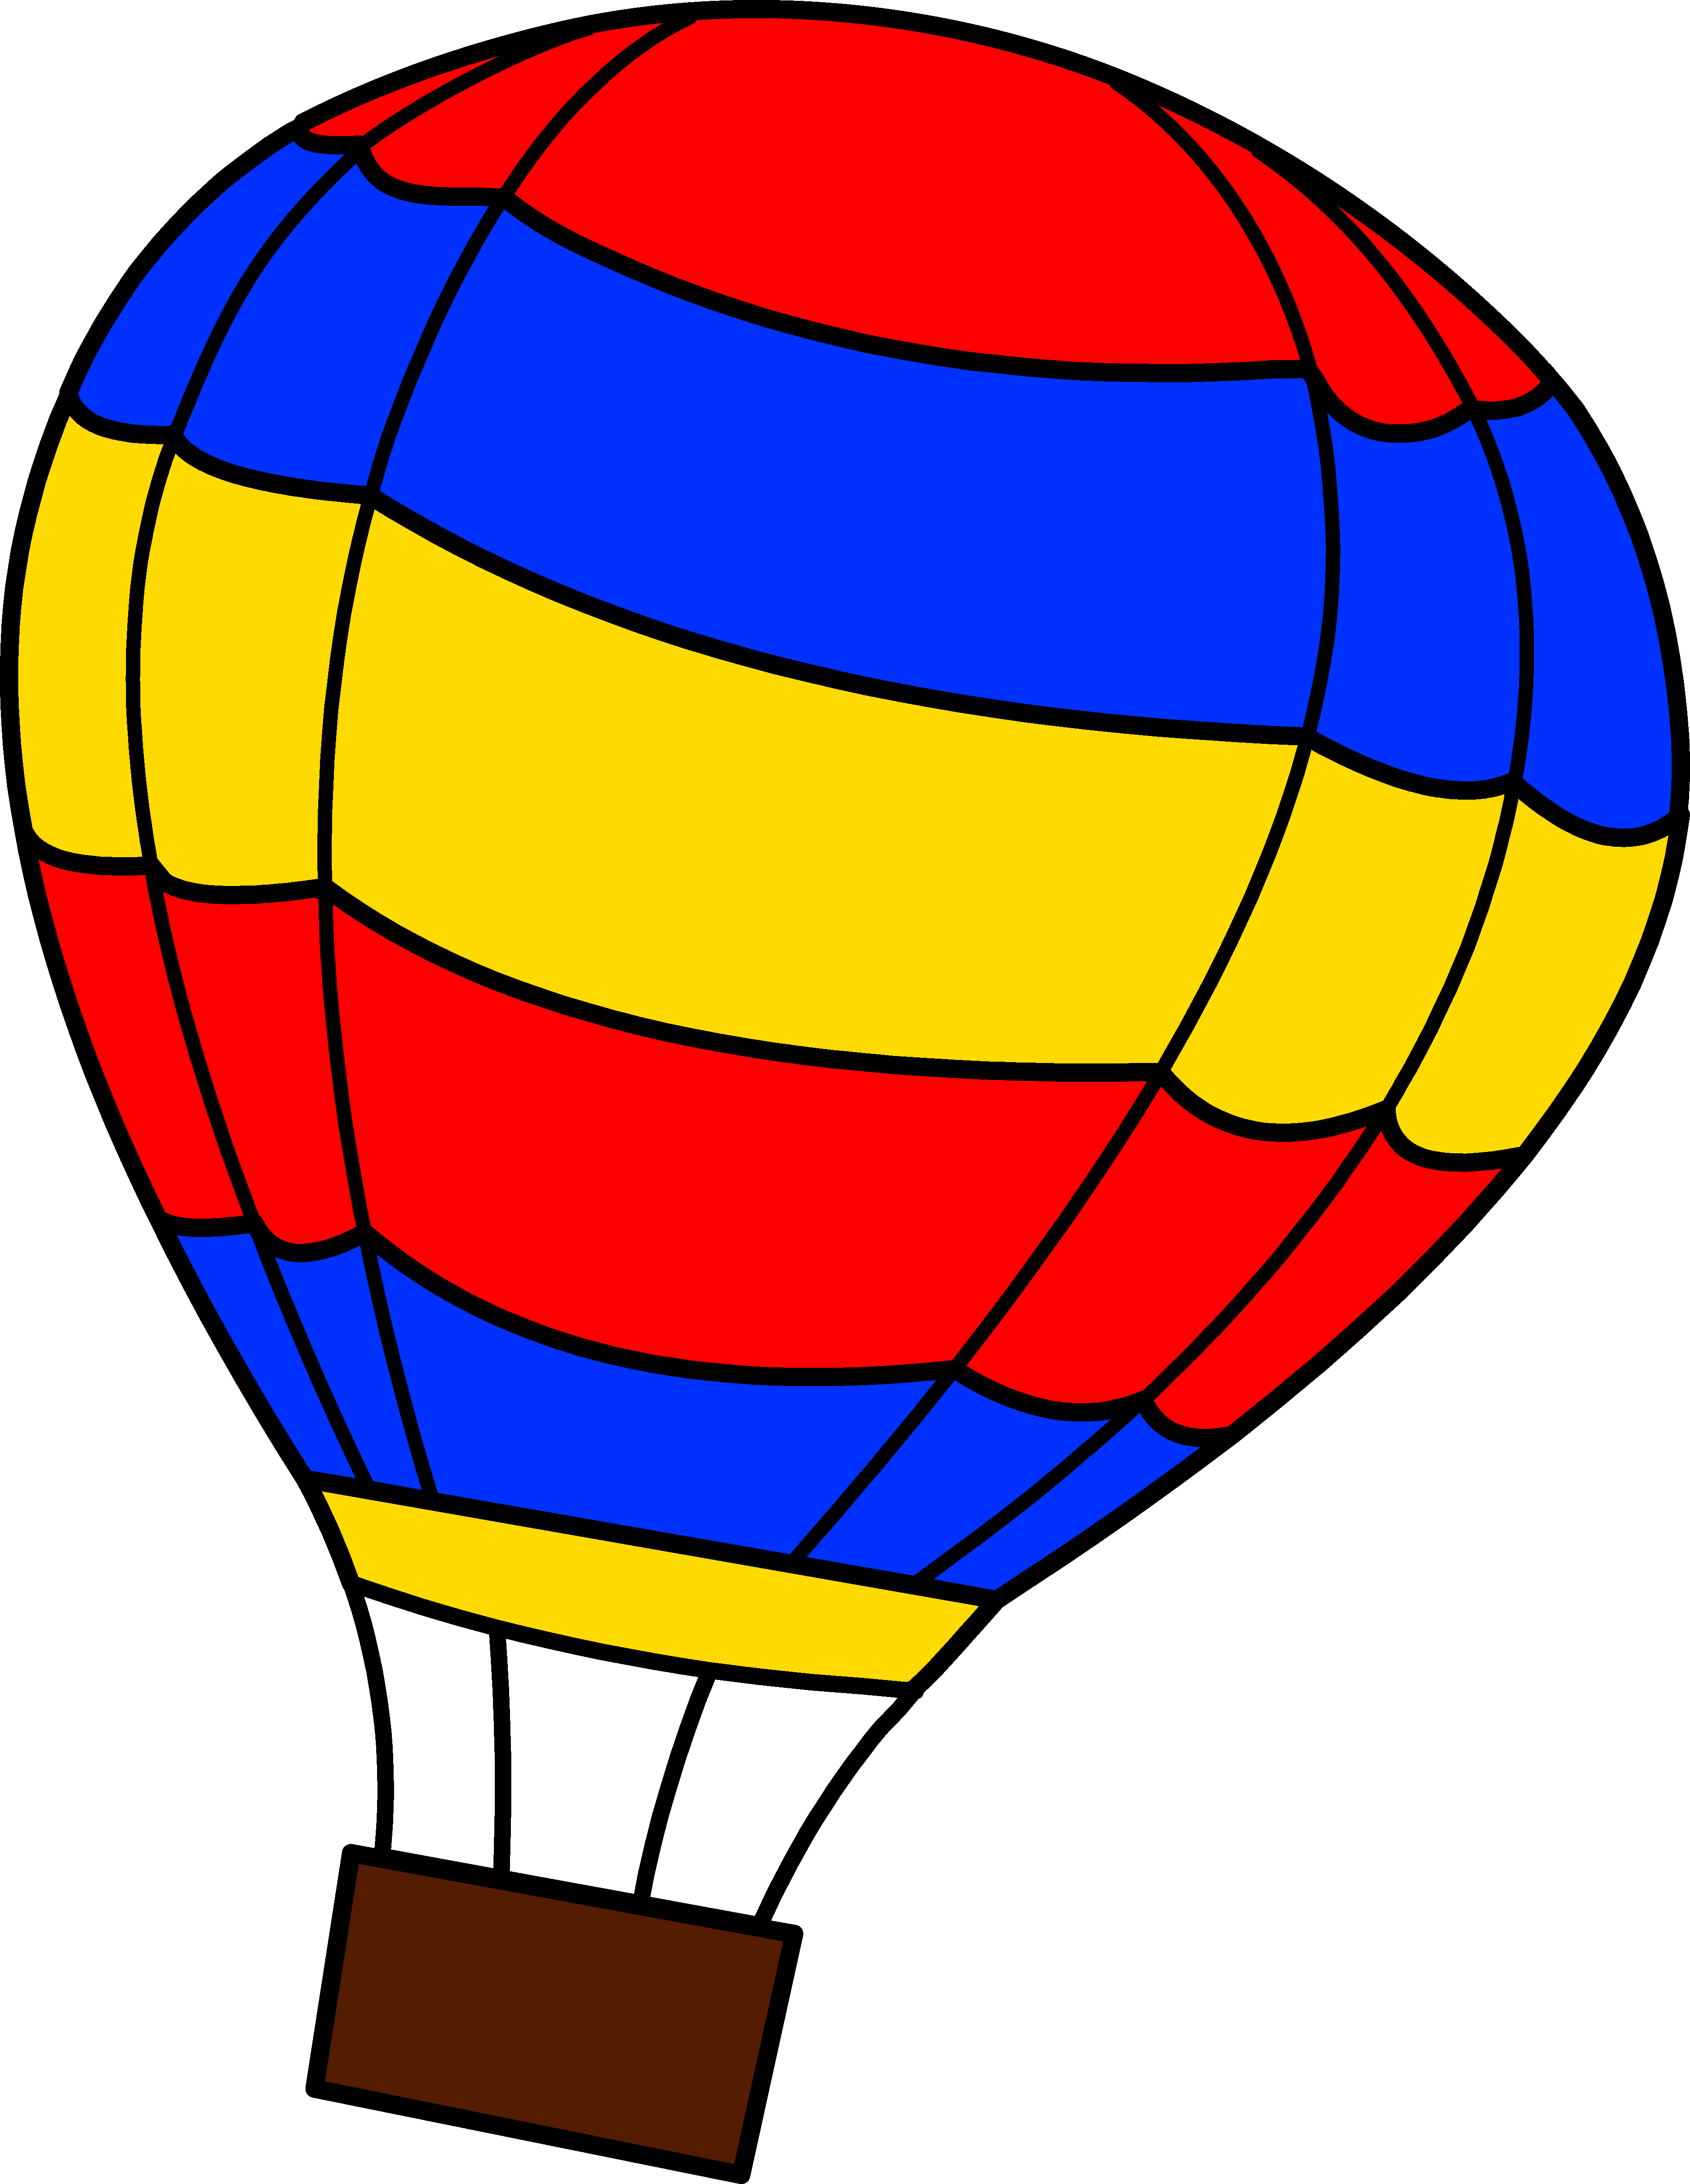 Hot Air Balloon Clip Art-Hot Air Balloon Clip Art-8